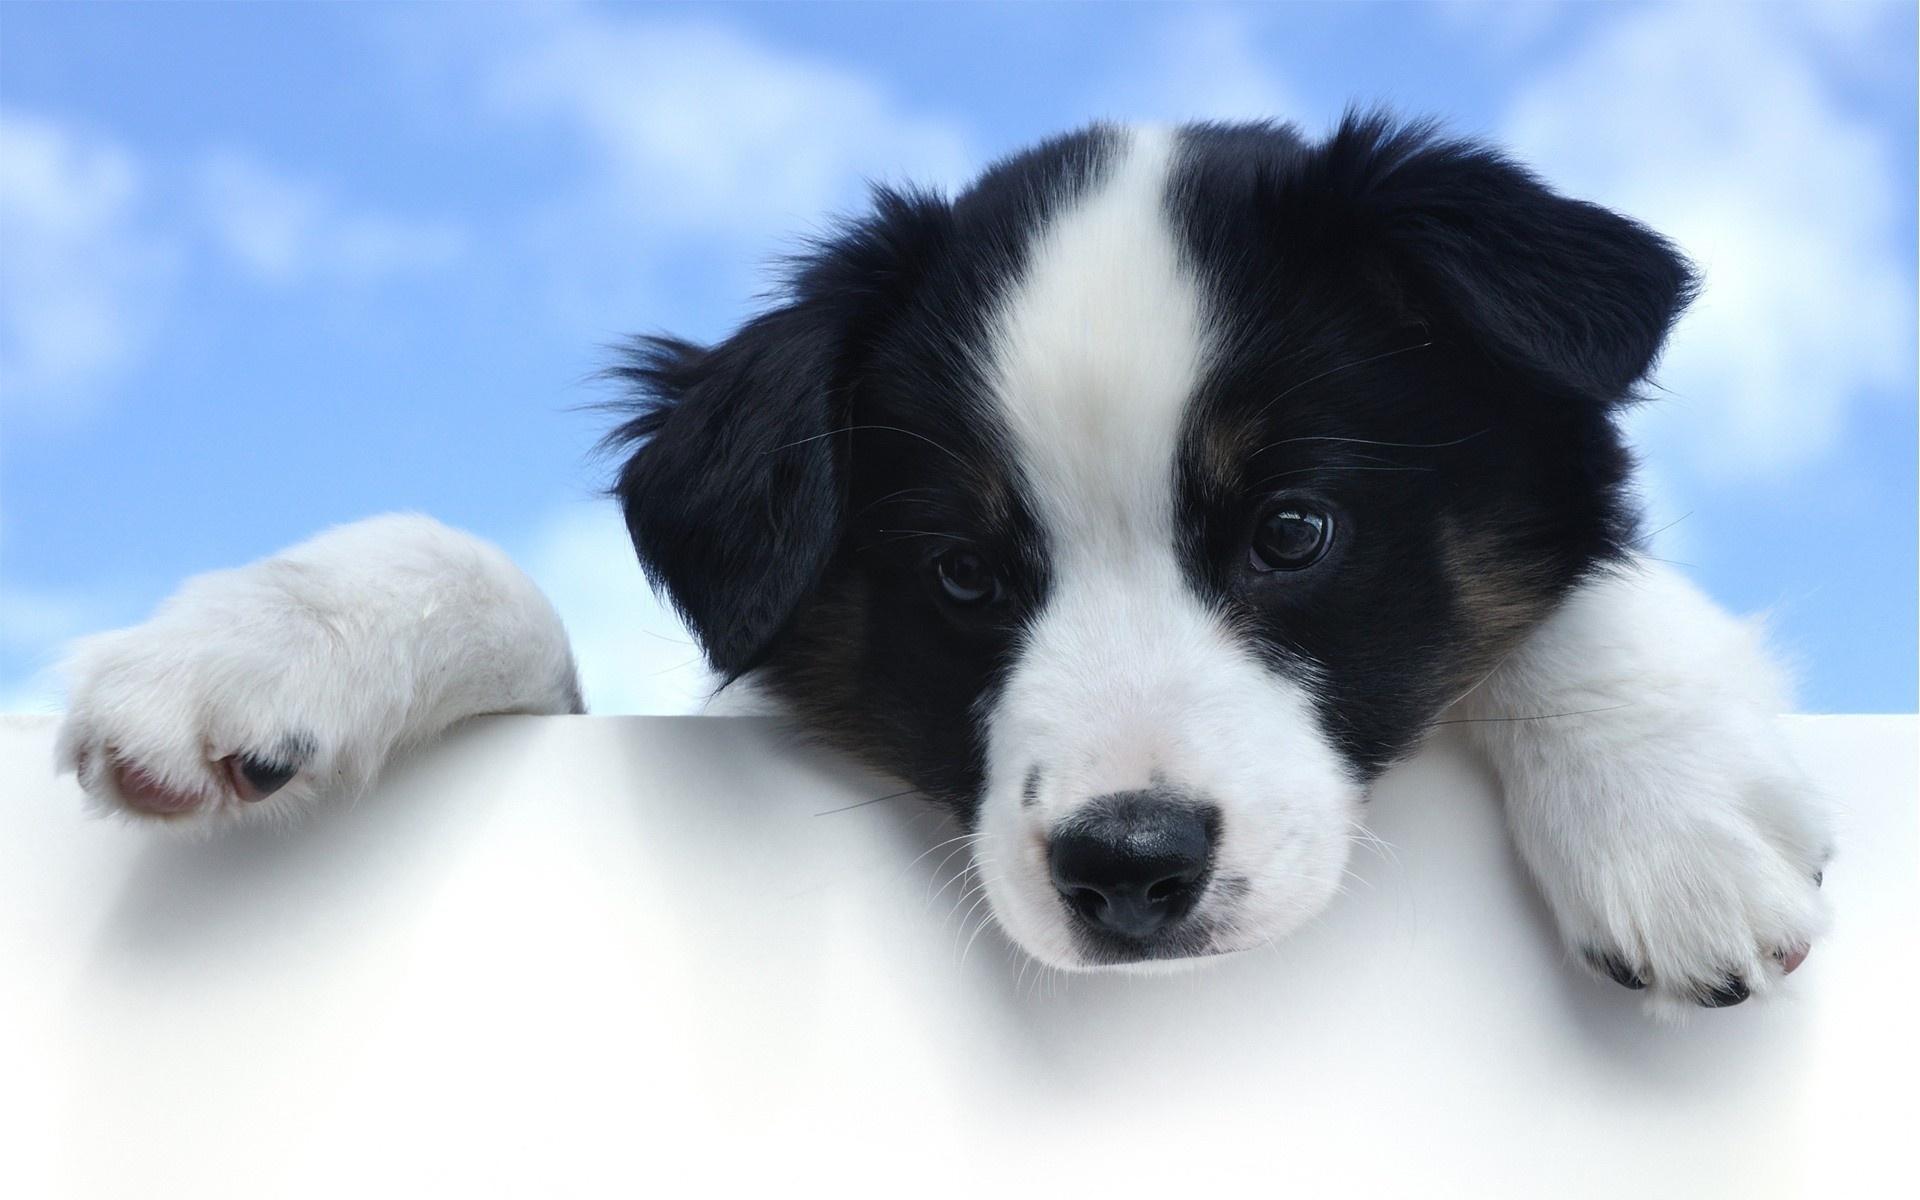 download wallpaper: Bordercollie puppie wallpaper